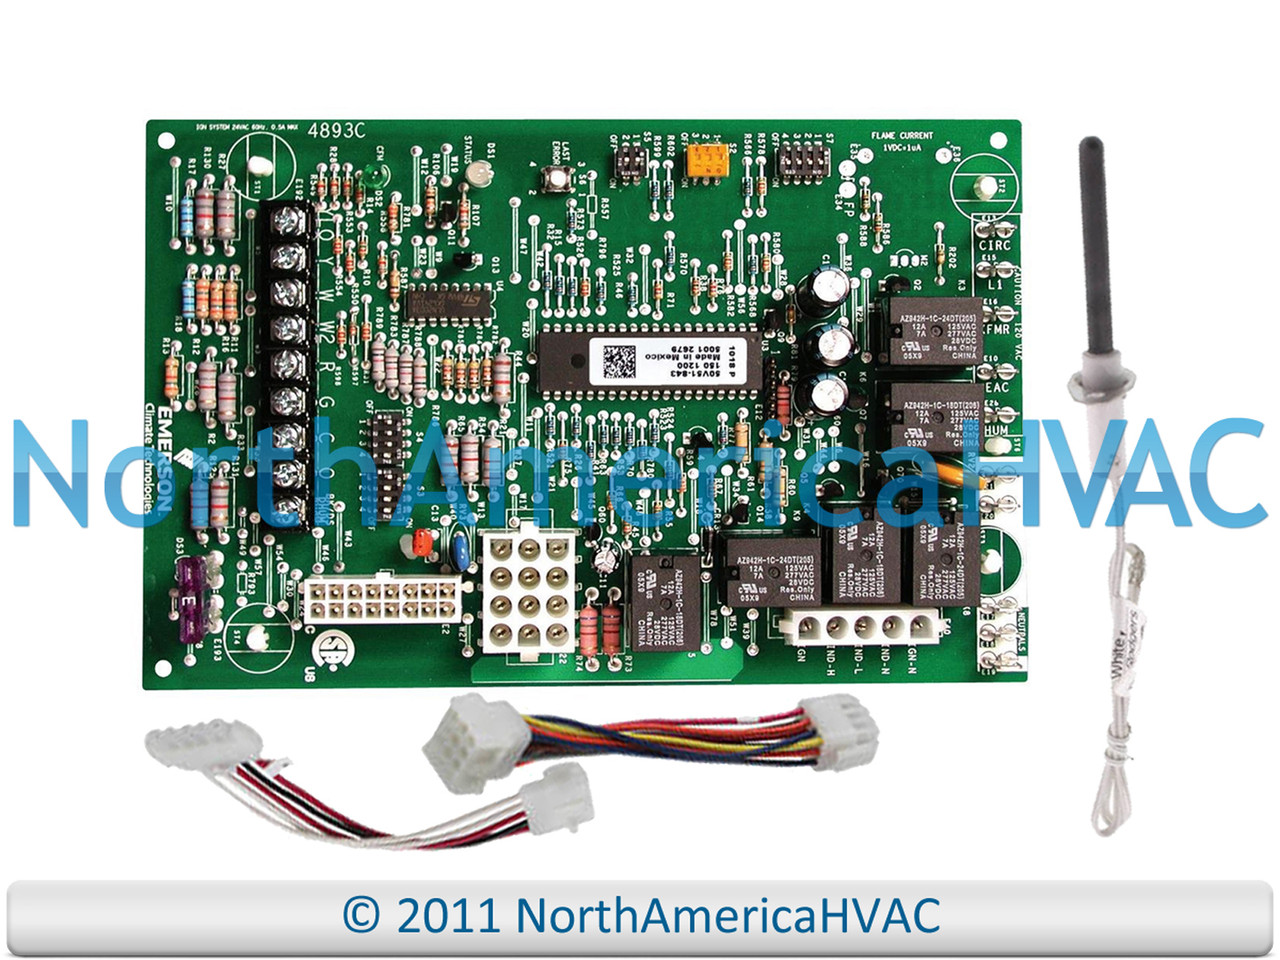 Lennox Armstrong Ducane 2Stg Furnace Control Circuit Board Module 49M59  49M5901 - North America HVACNorth America HVAC